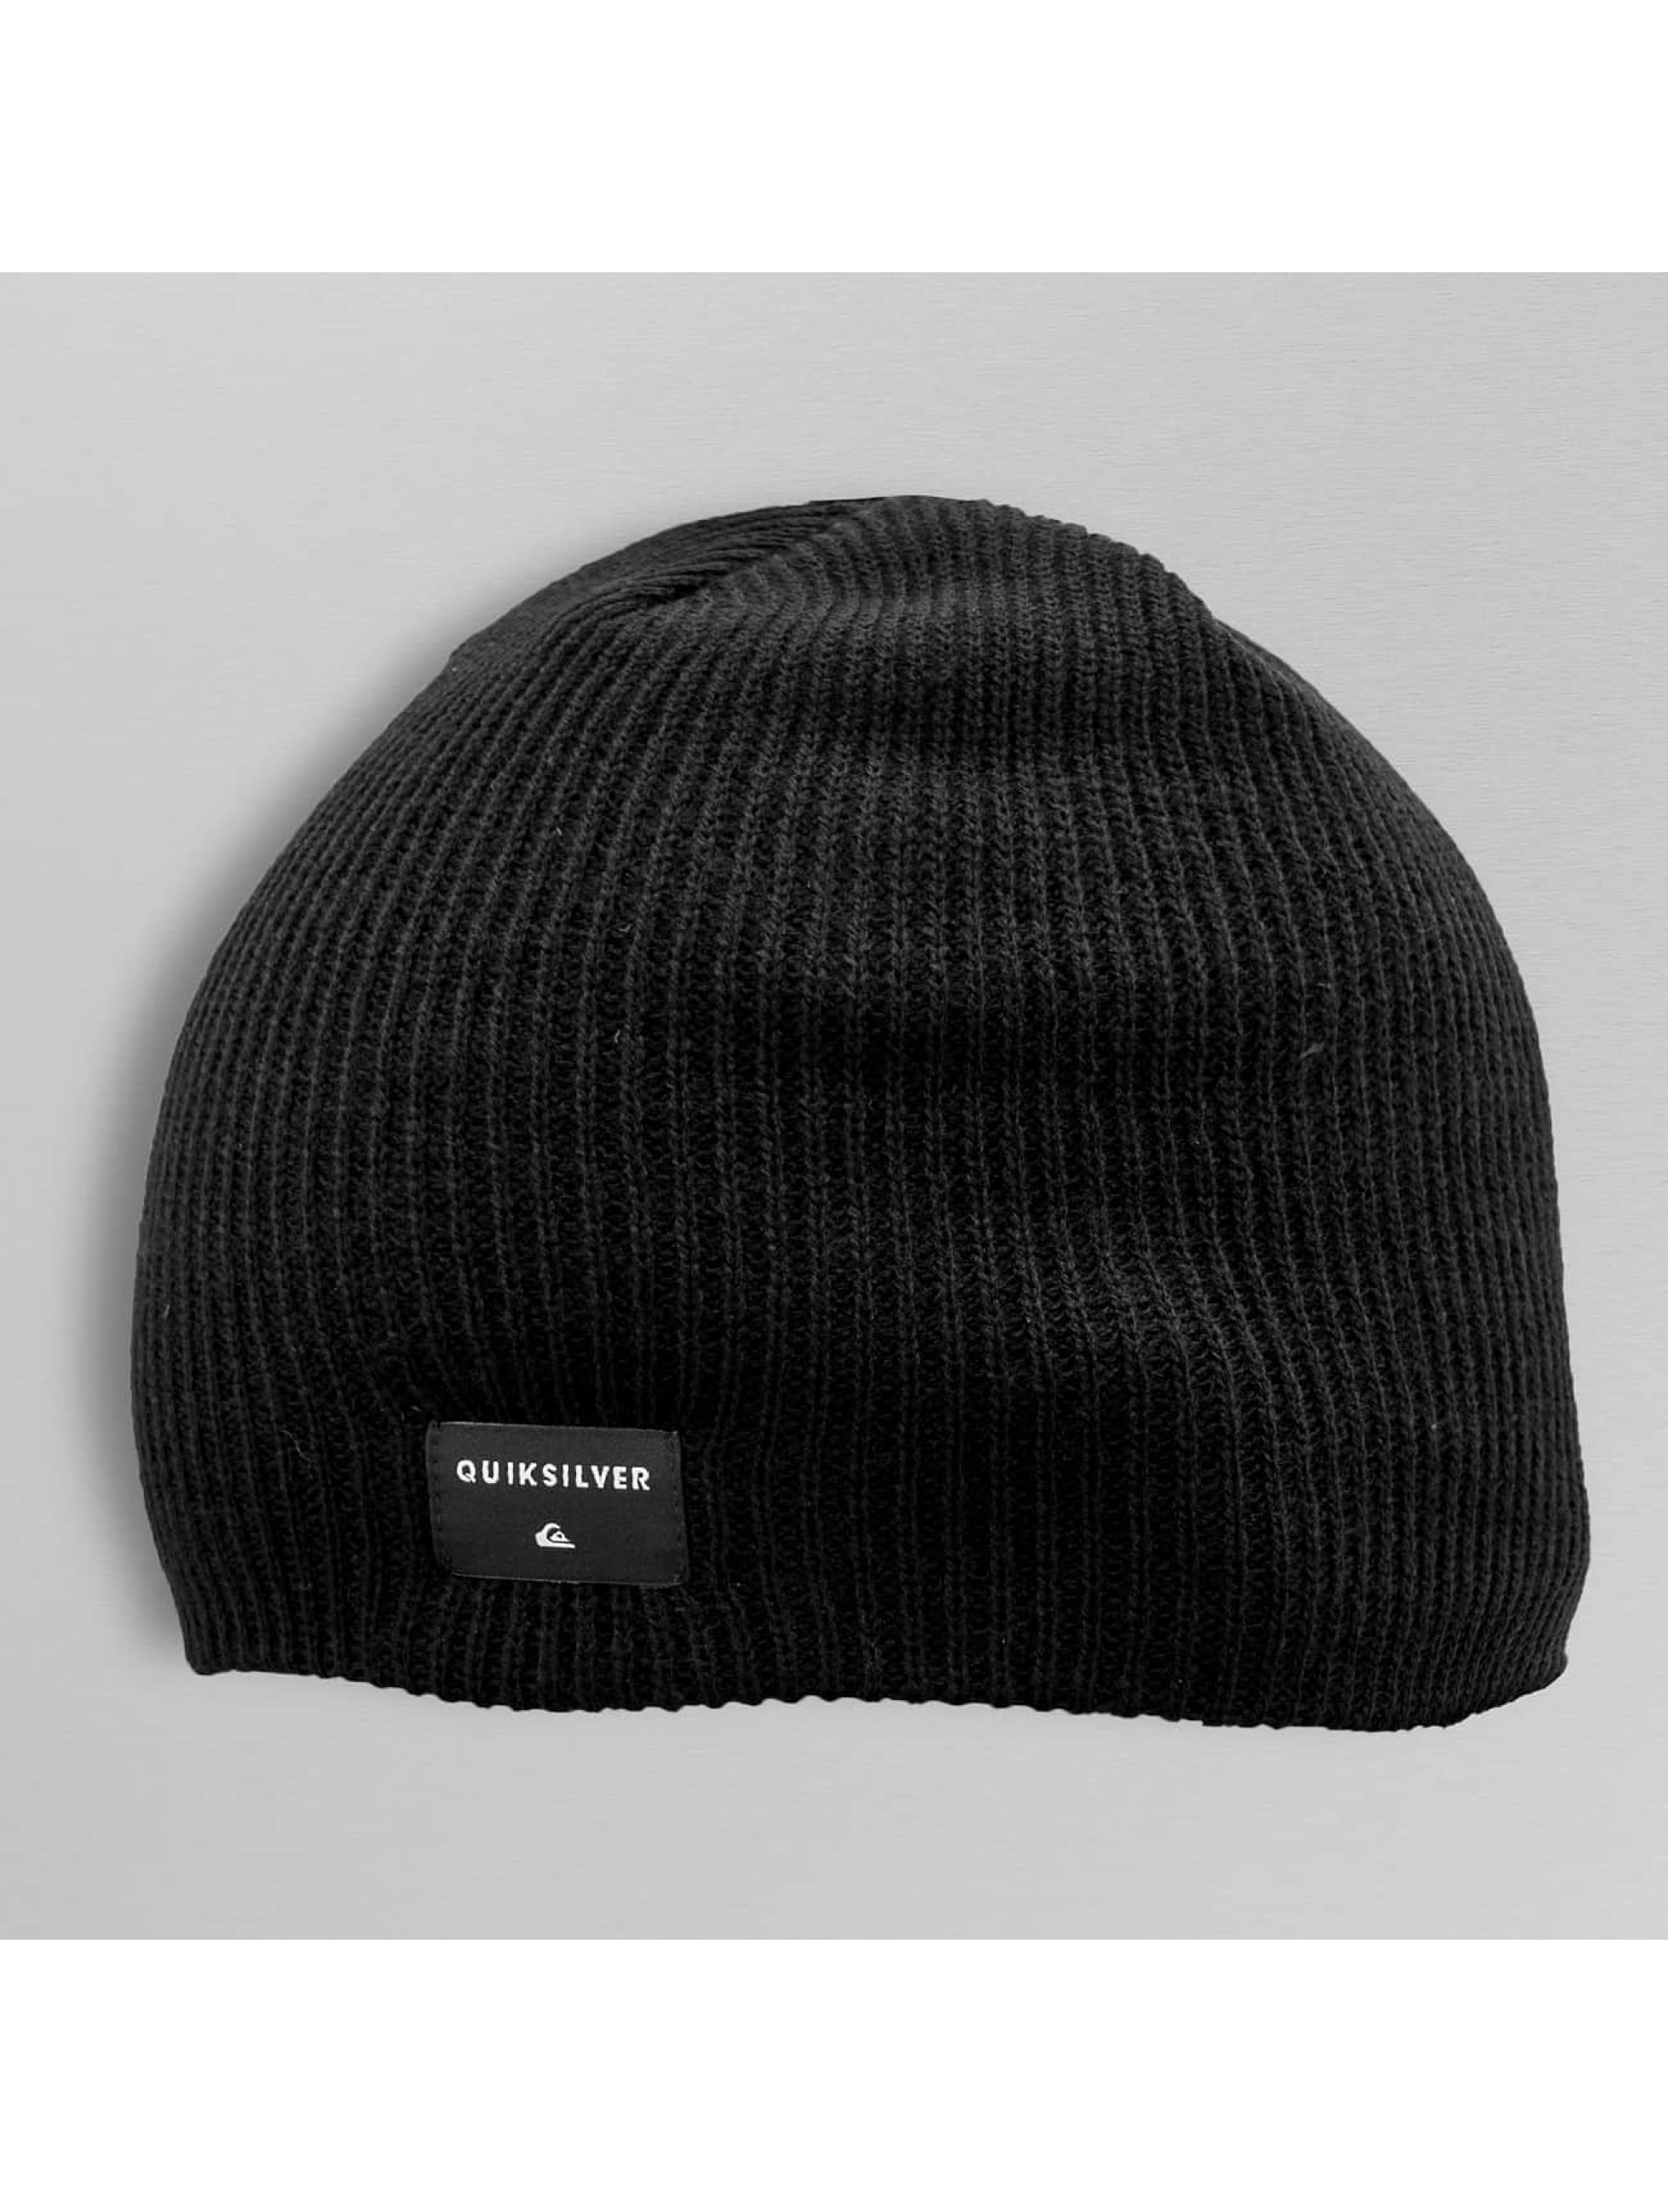 Quiksilver Hat-1 Cushy black